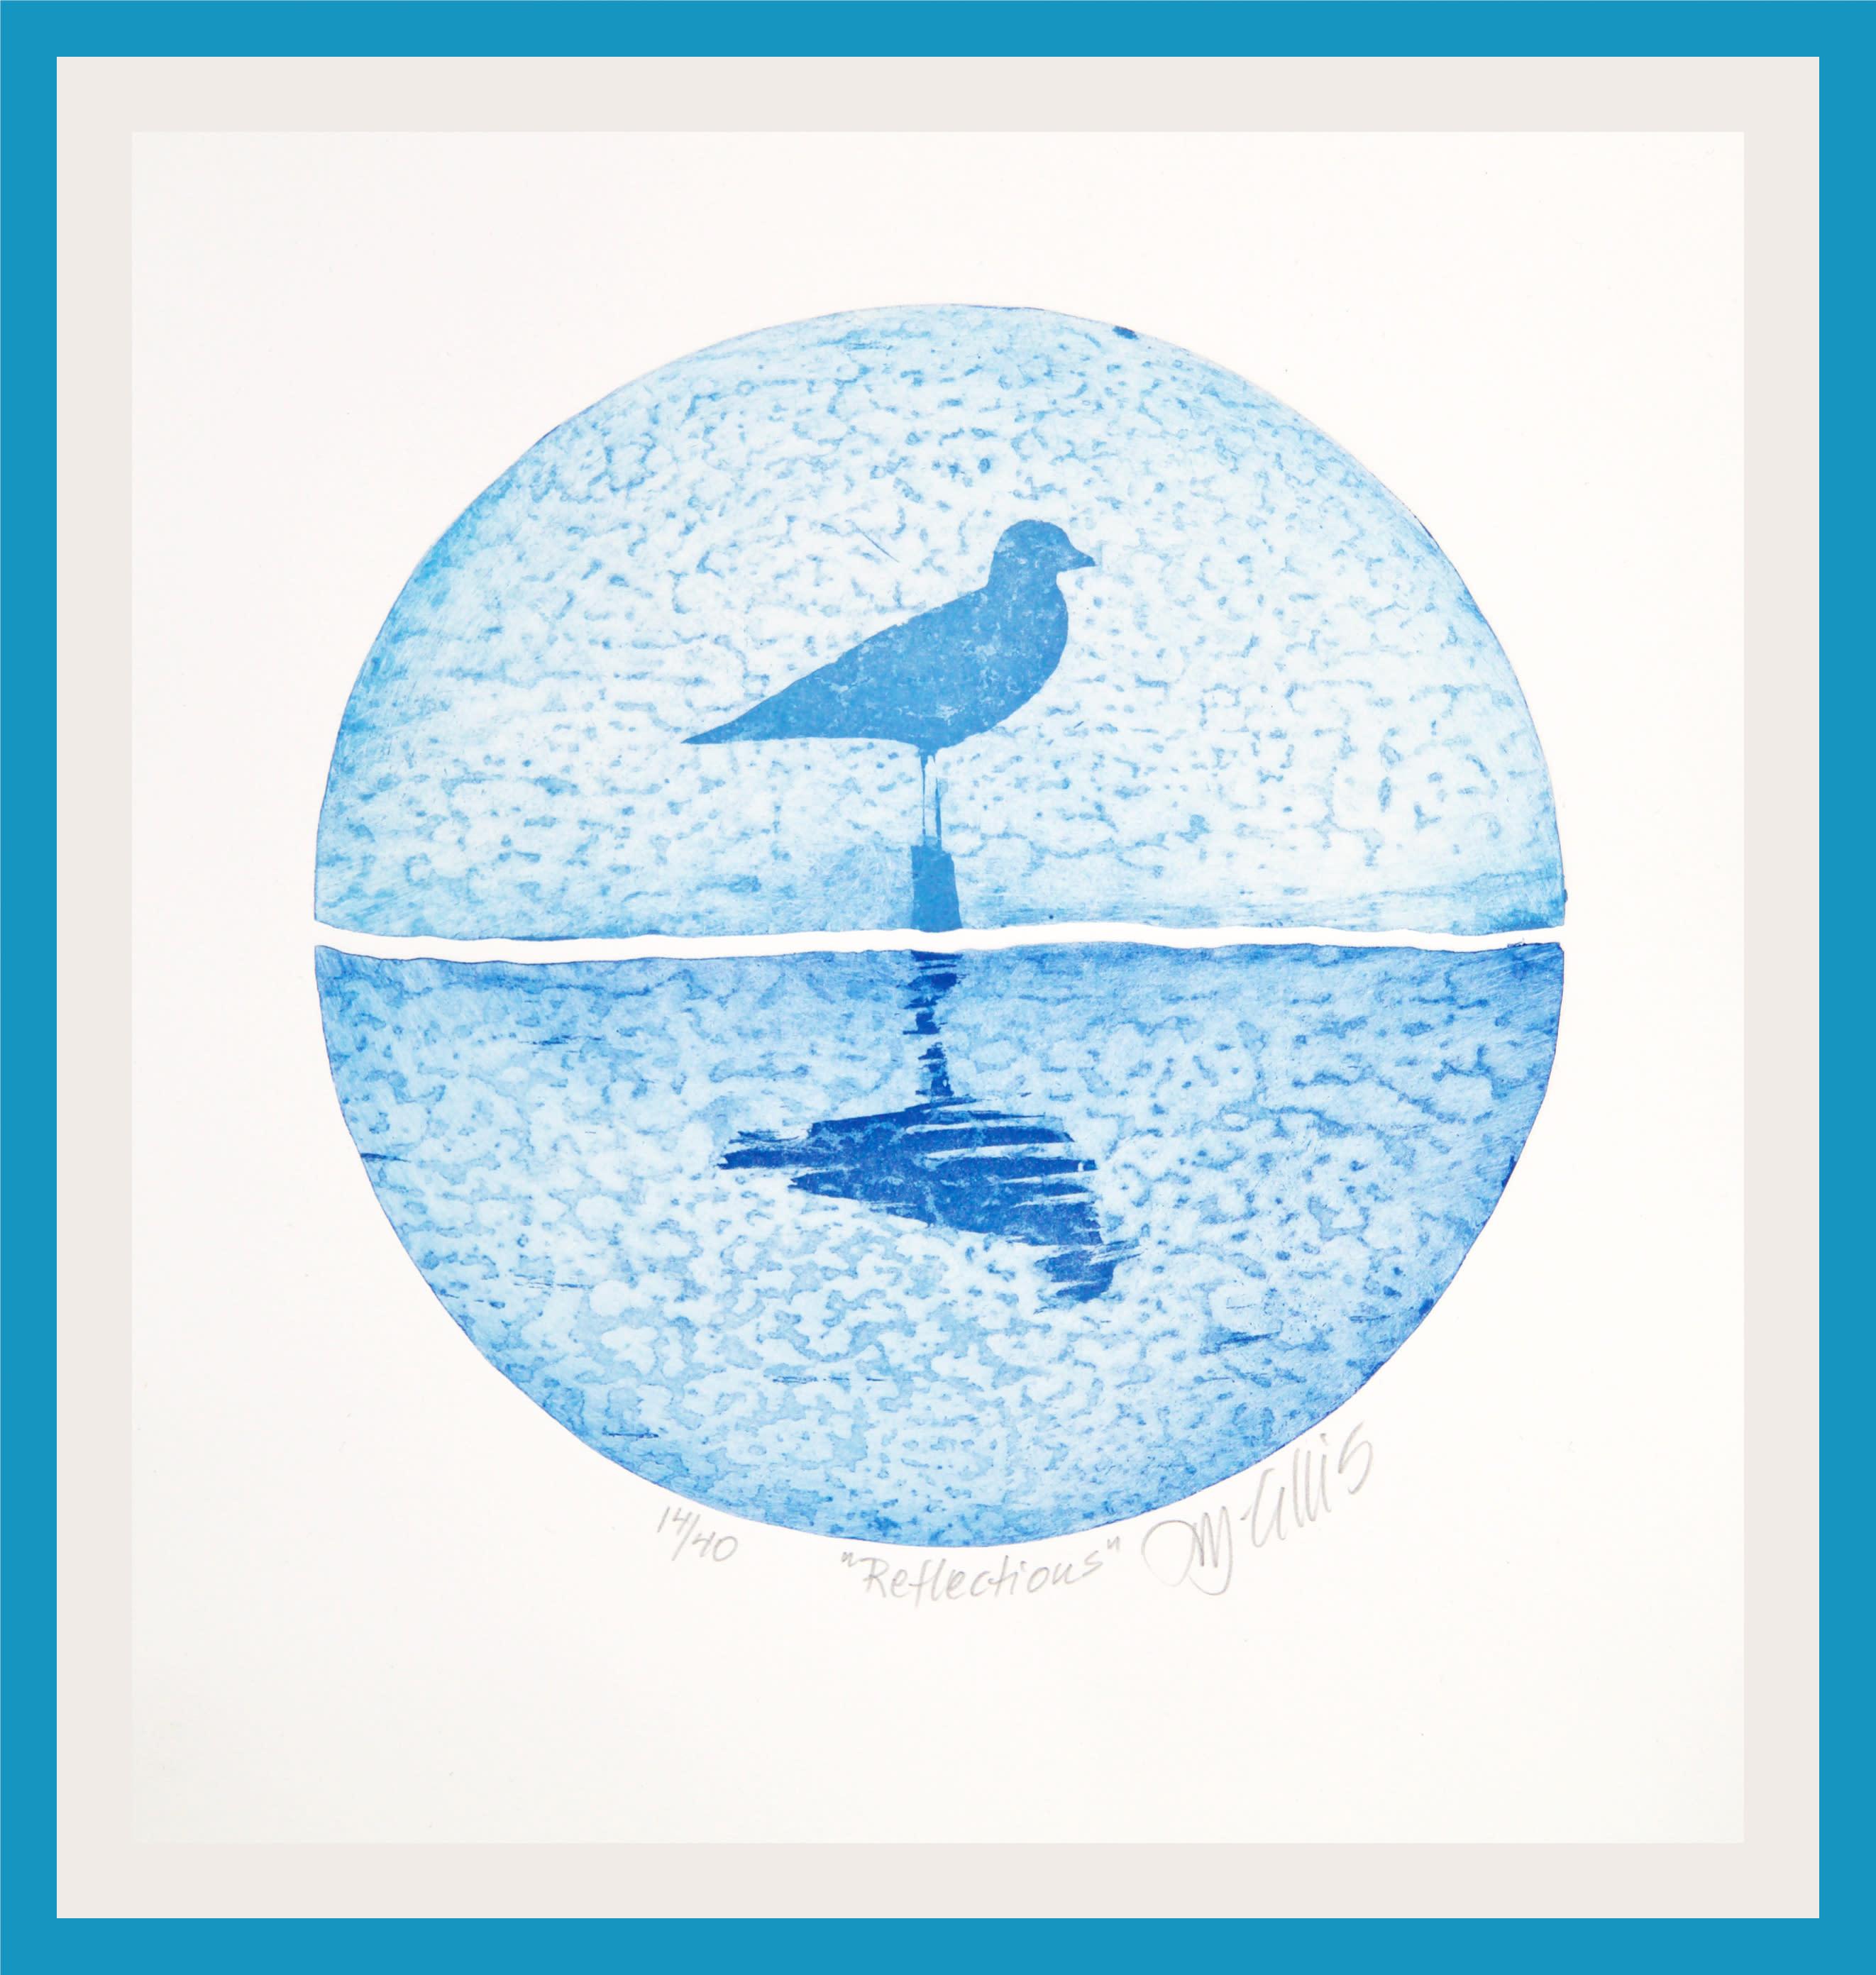 Reflections blue awggai